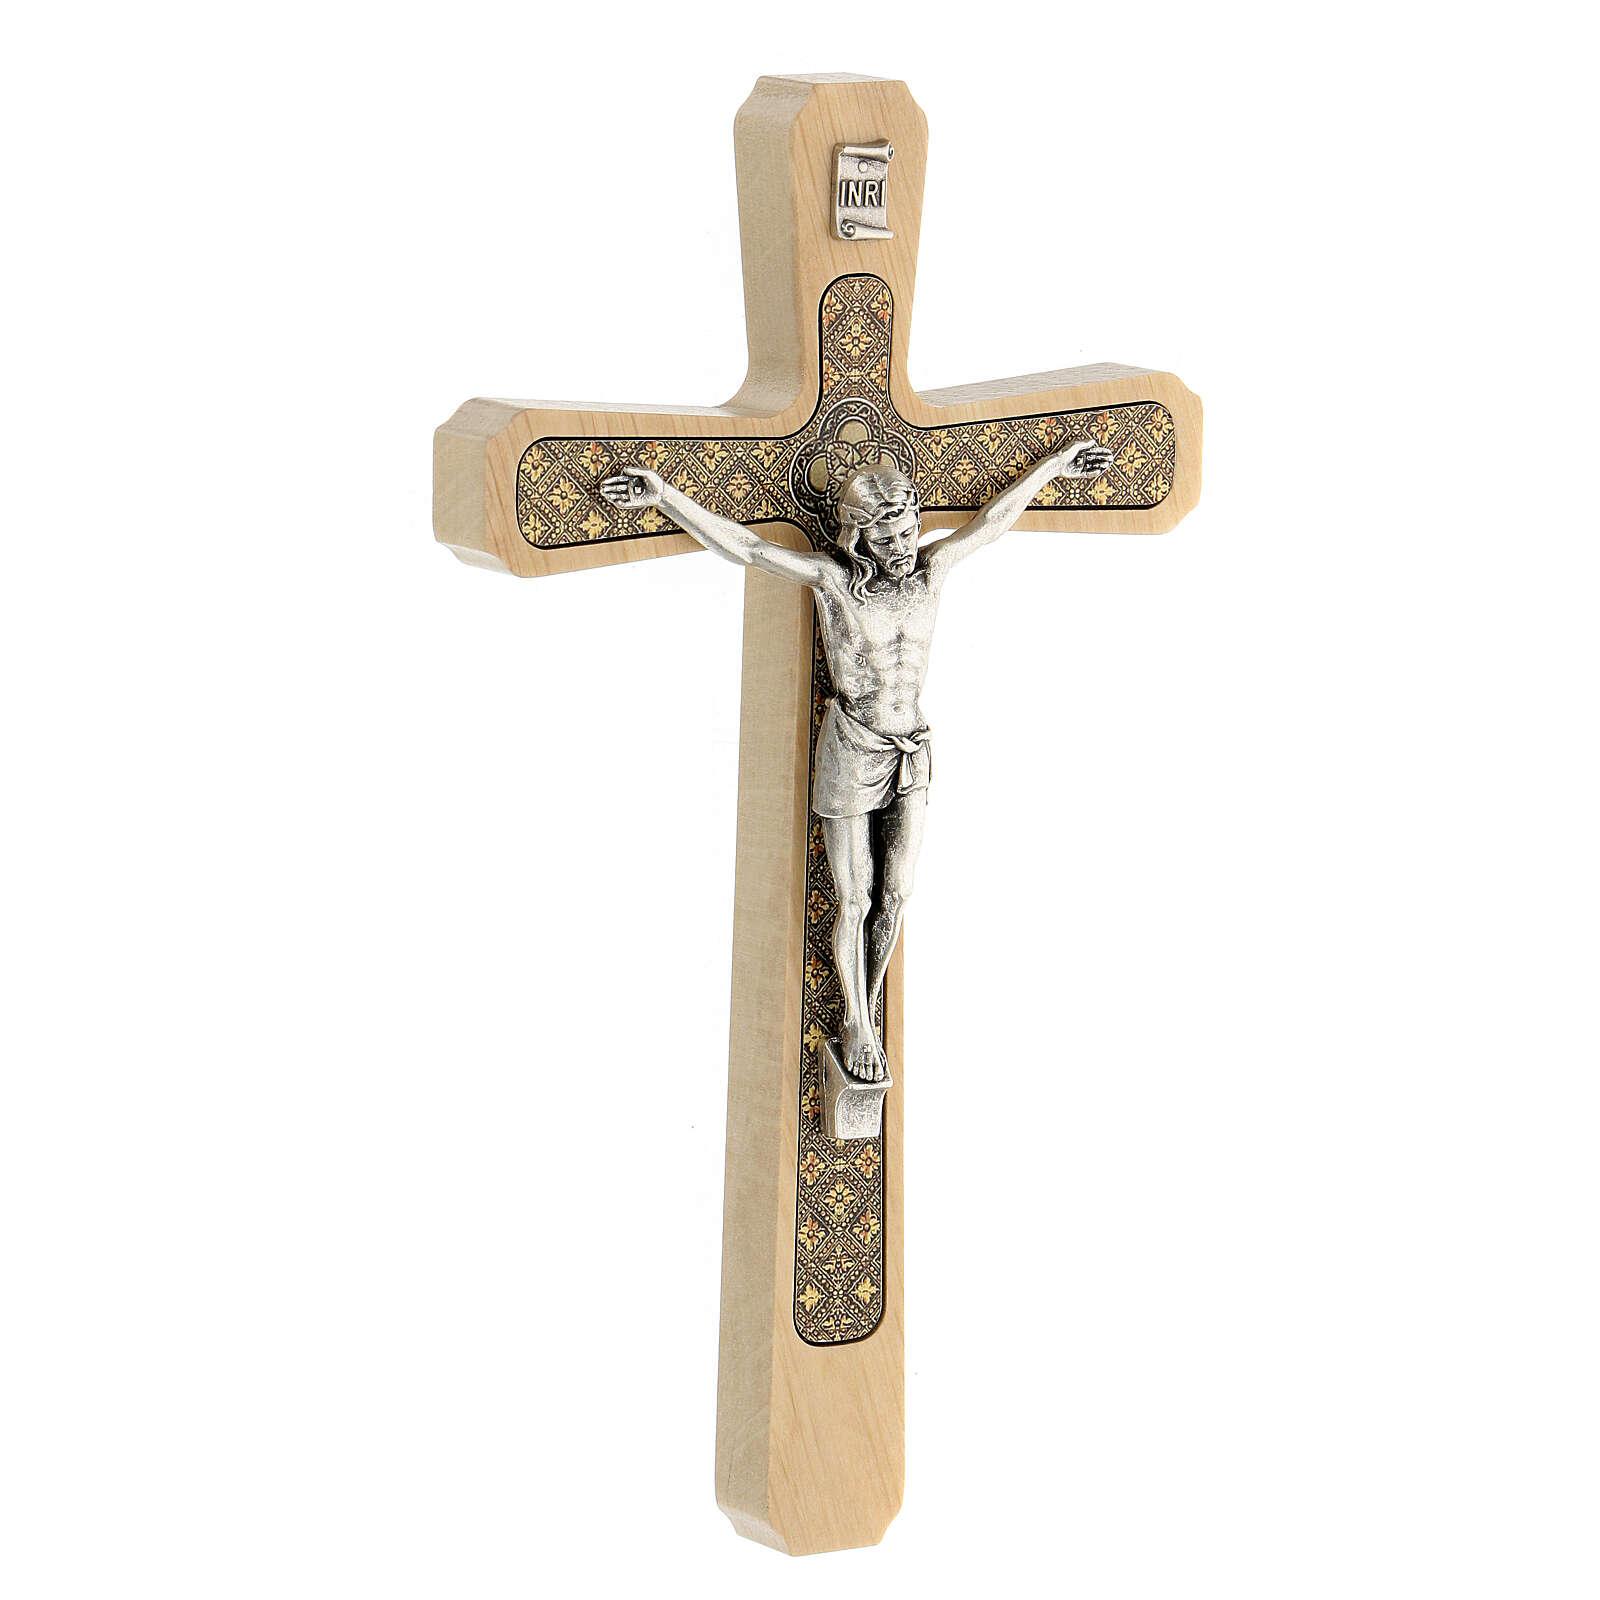 Crucifijo madera clara colgar motivo floral 20 cm 4